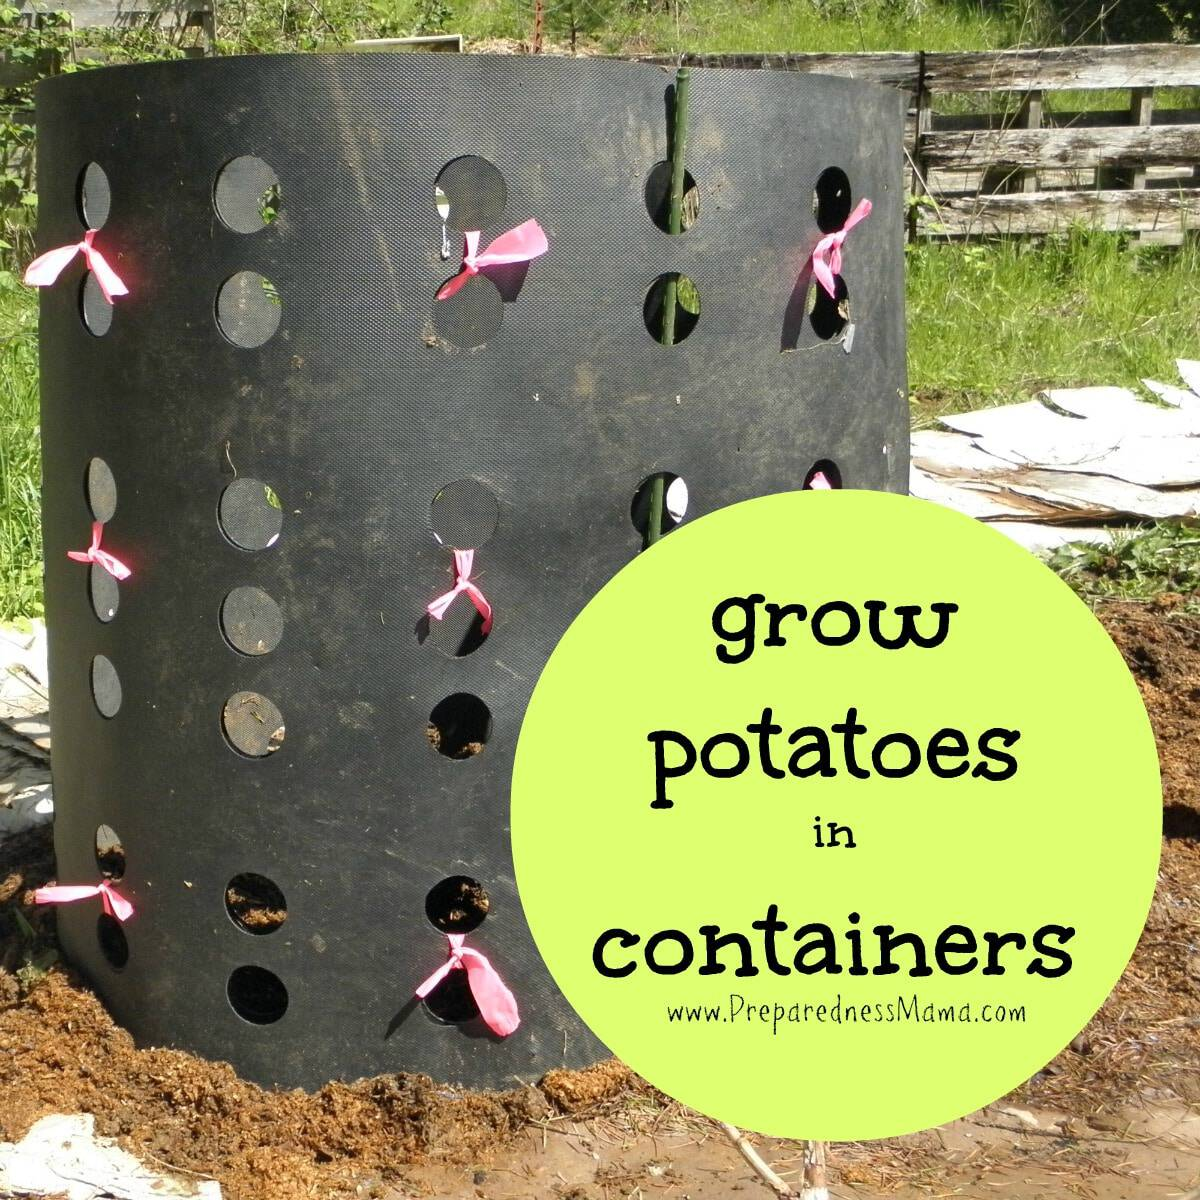 Grow Potatoes In Containers  Preparednessmama